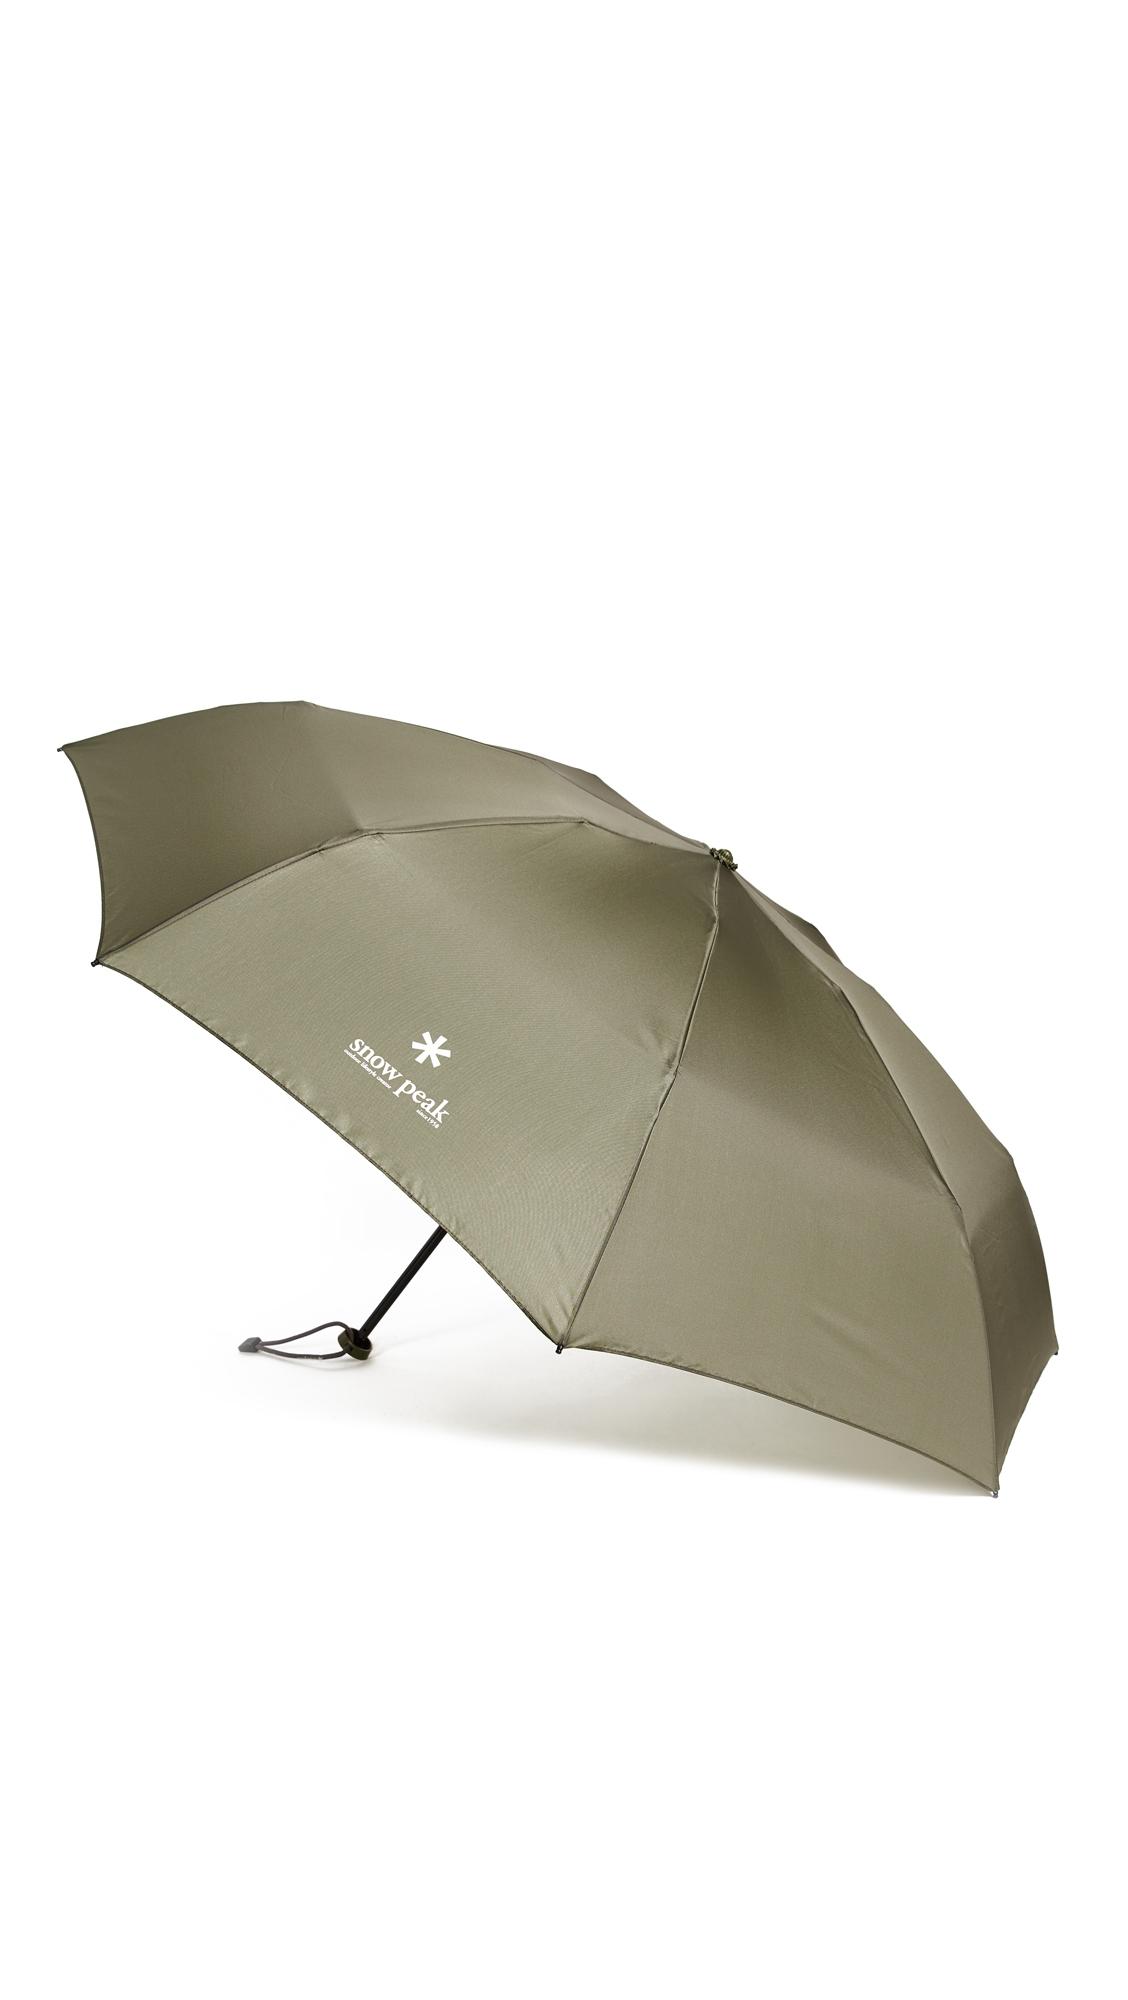 Umbrella in Grey from EAST DANE